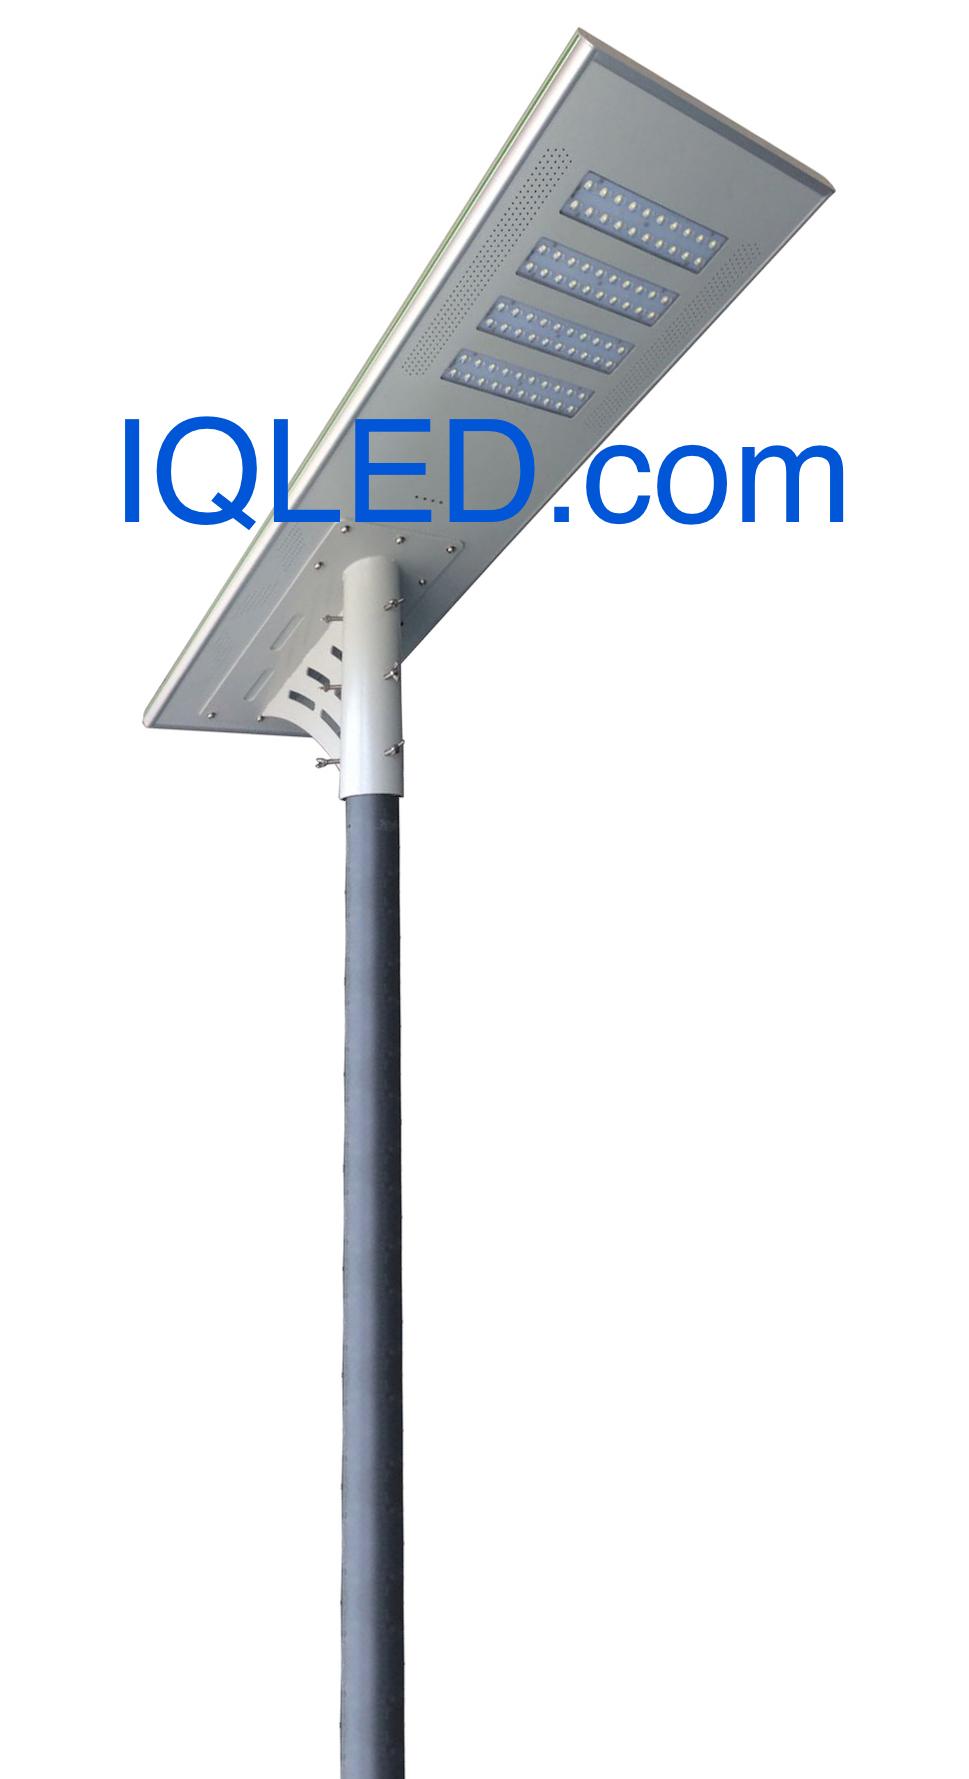 IQLED.com Solar Light LED Integrated 8800 Lumens 80 Watts